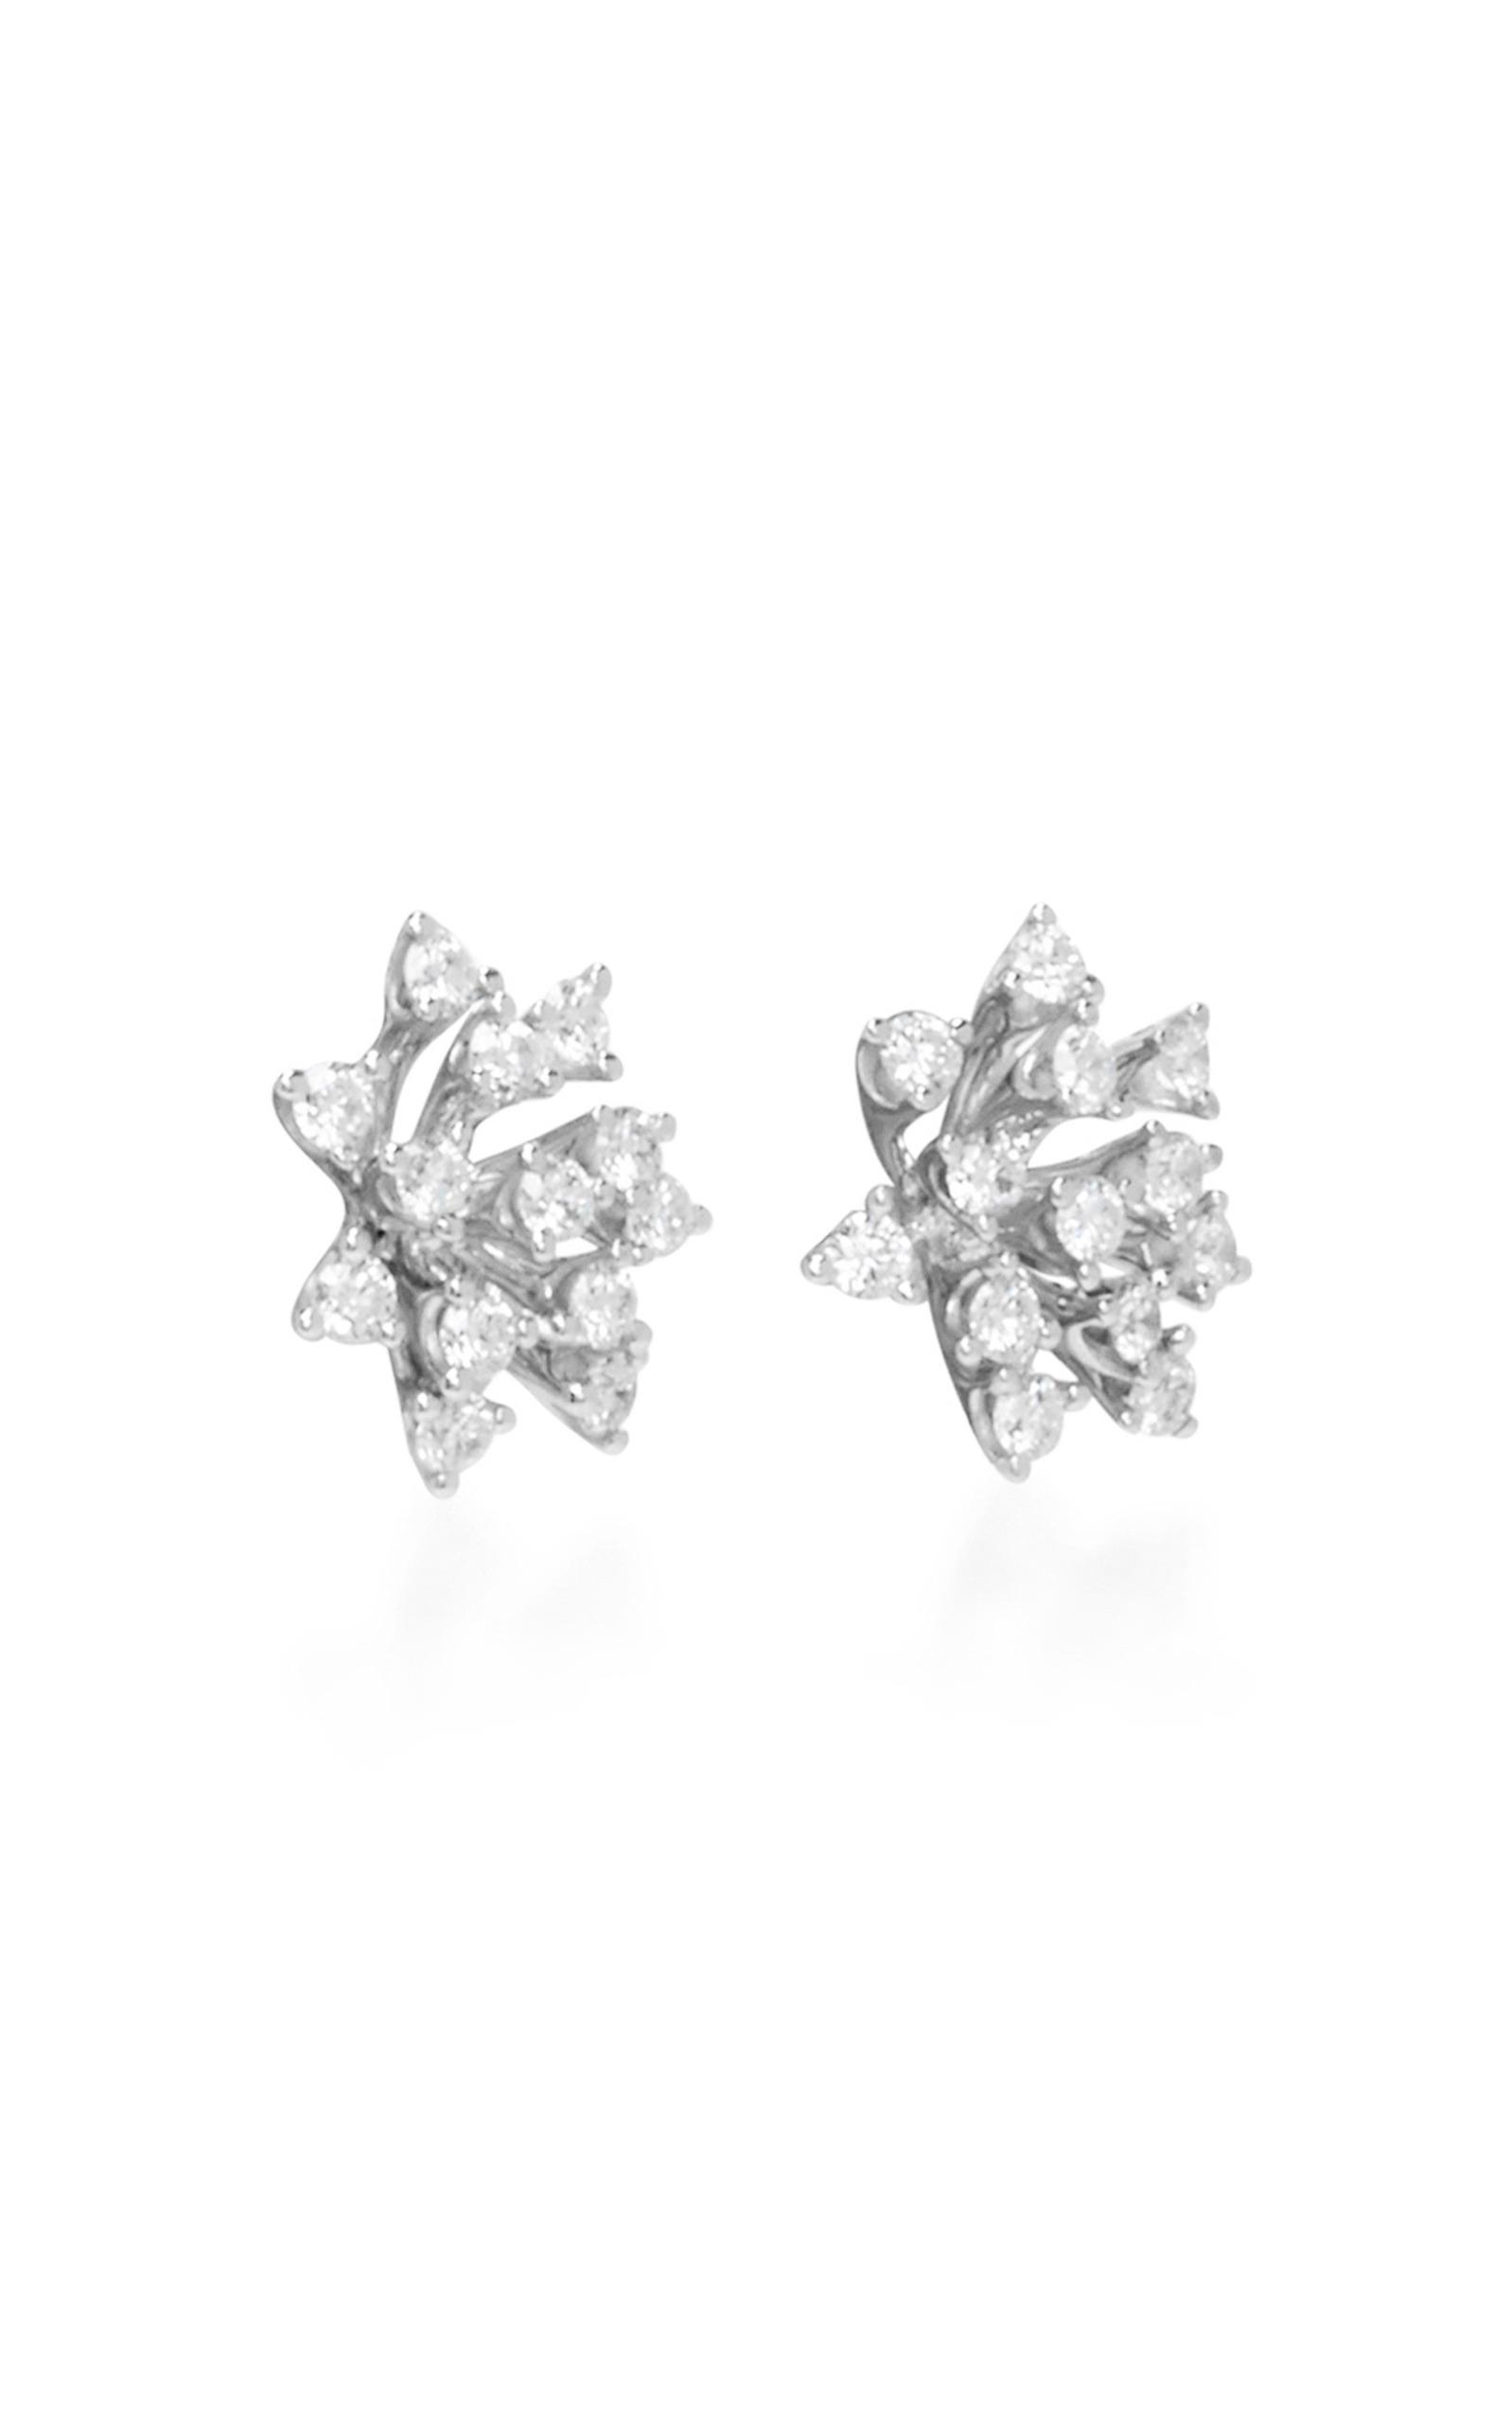 Luminus White Diamond Stud Earrings Hueb nAWvM0a5tr